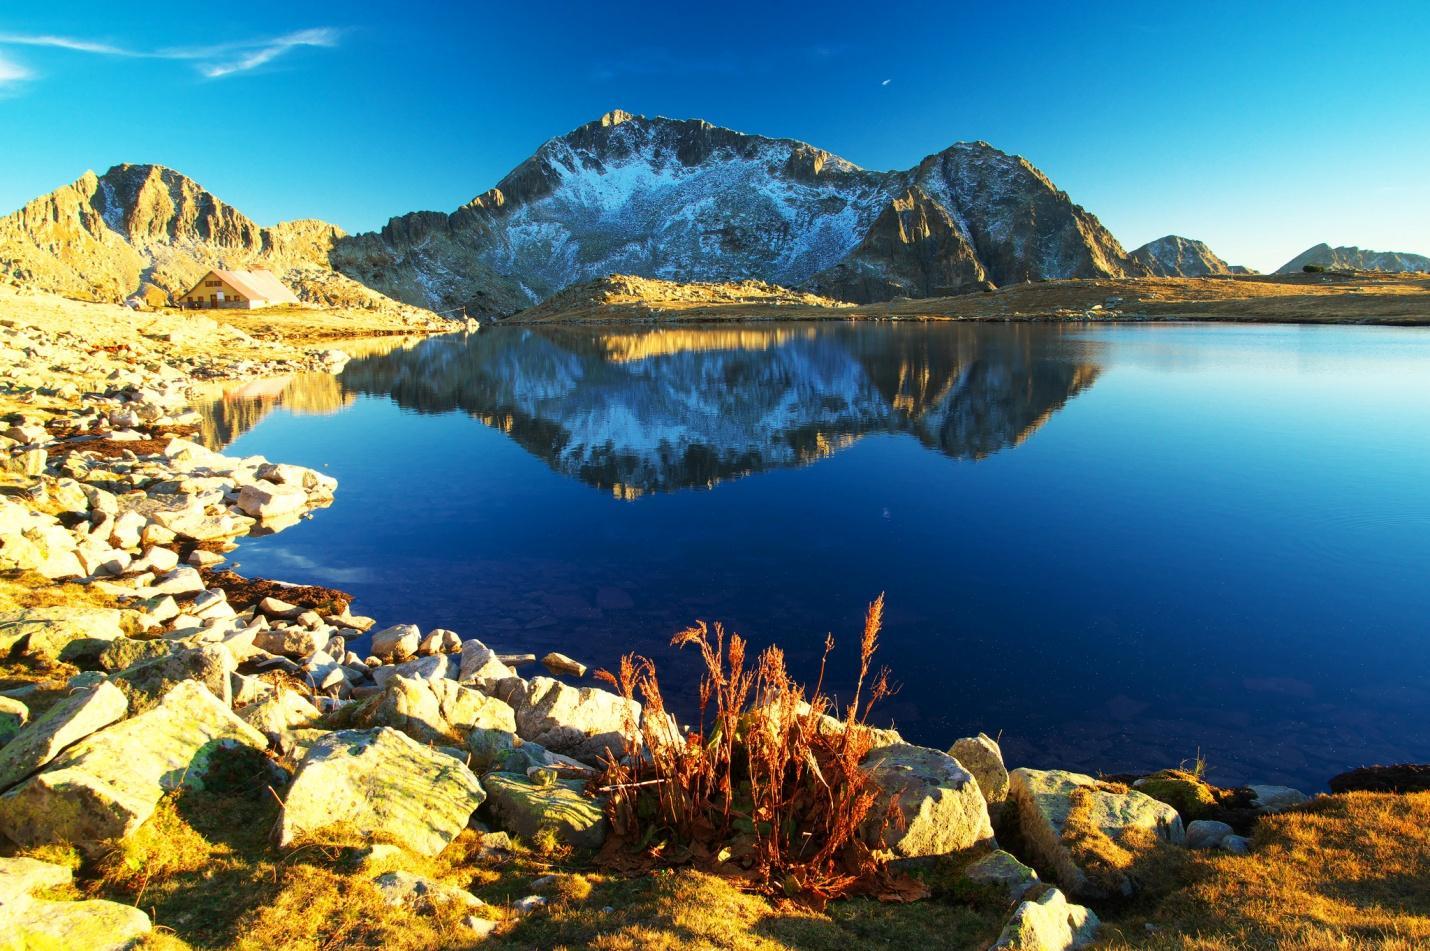 Jezera do vrha Vihren Lucki Bansko